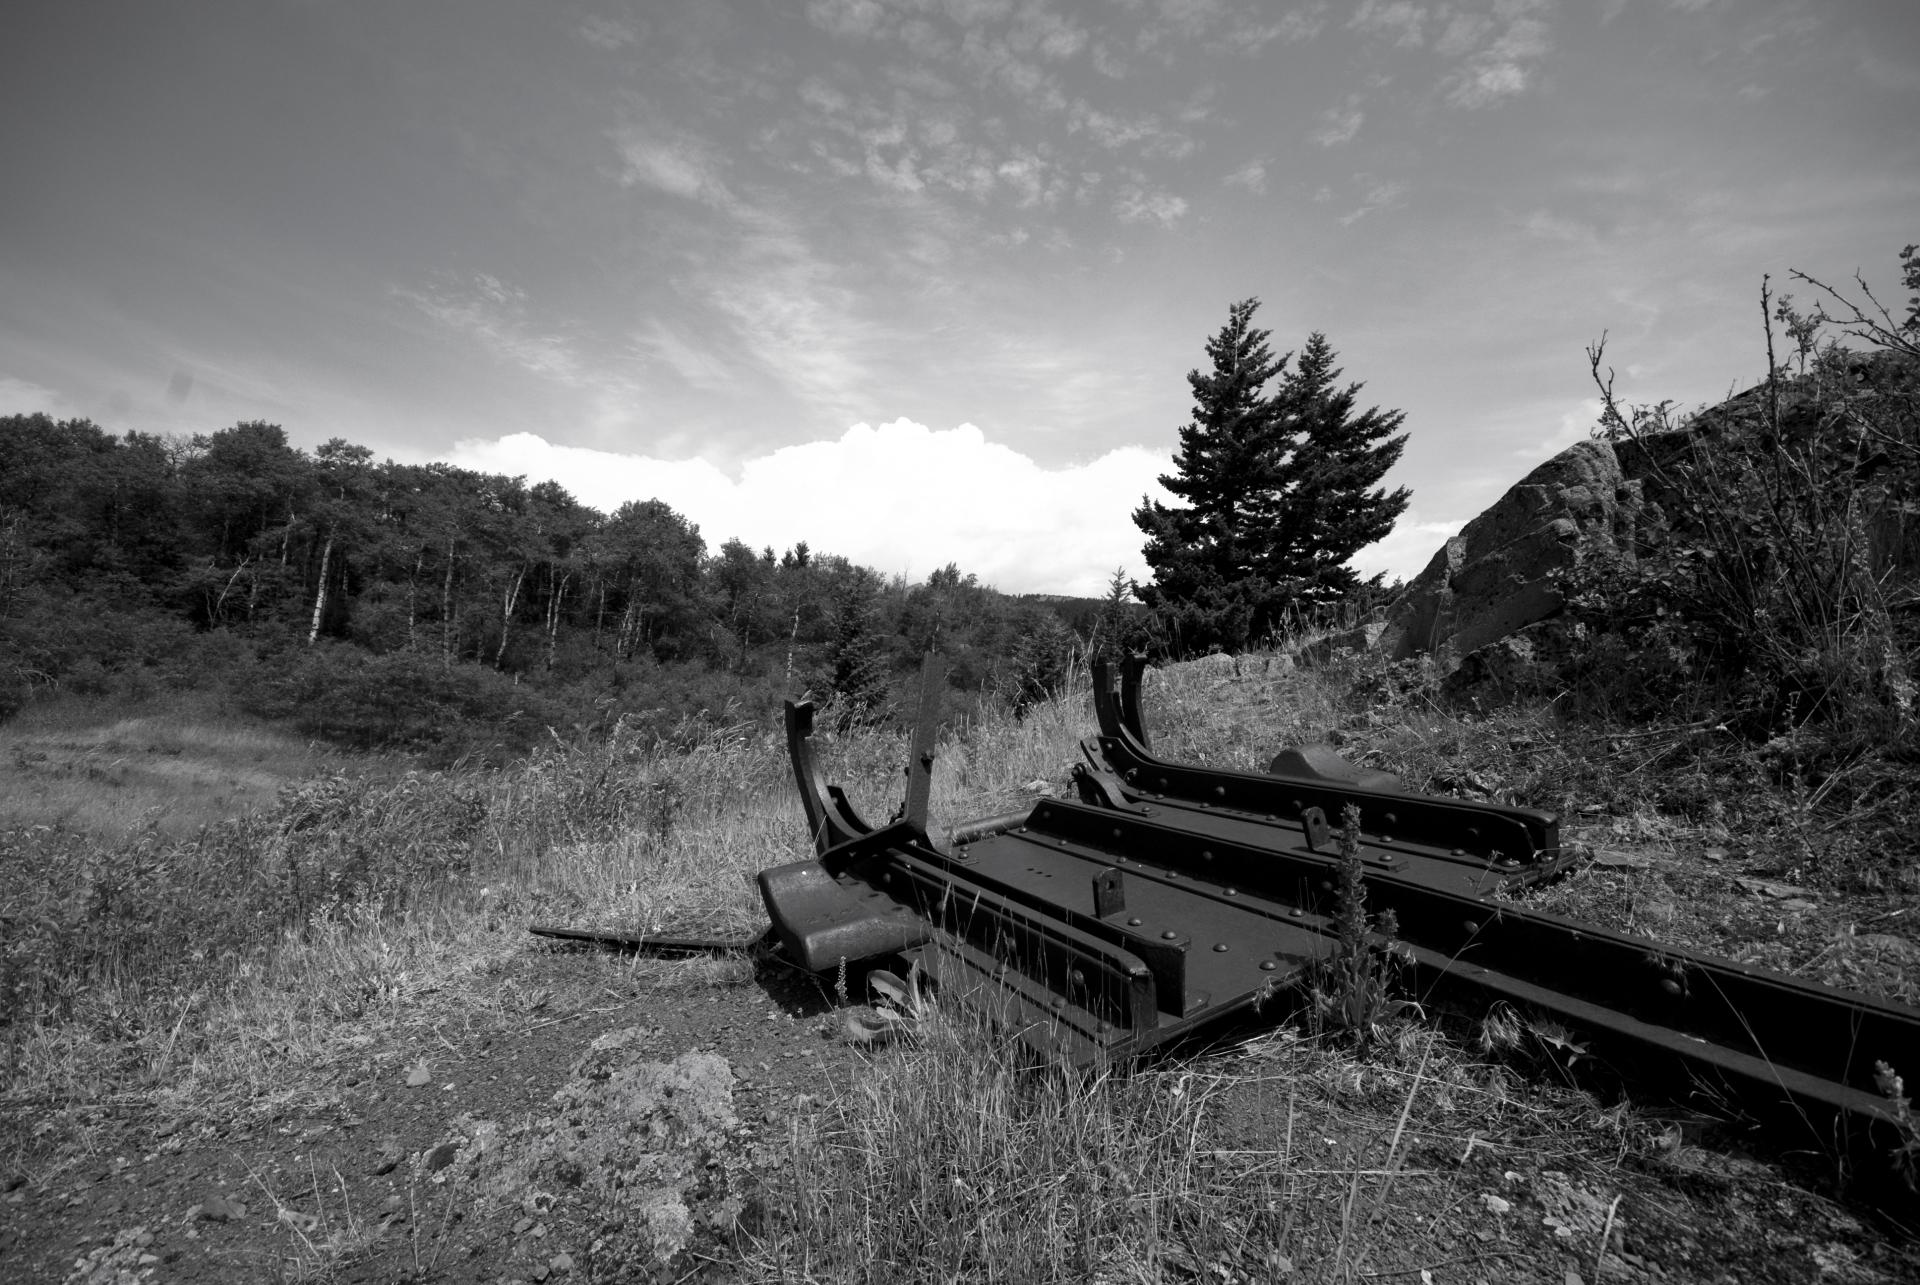 Desolate Memories of an Industry